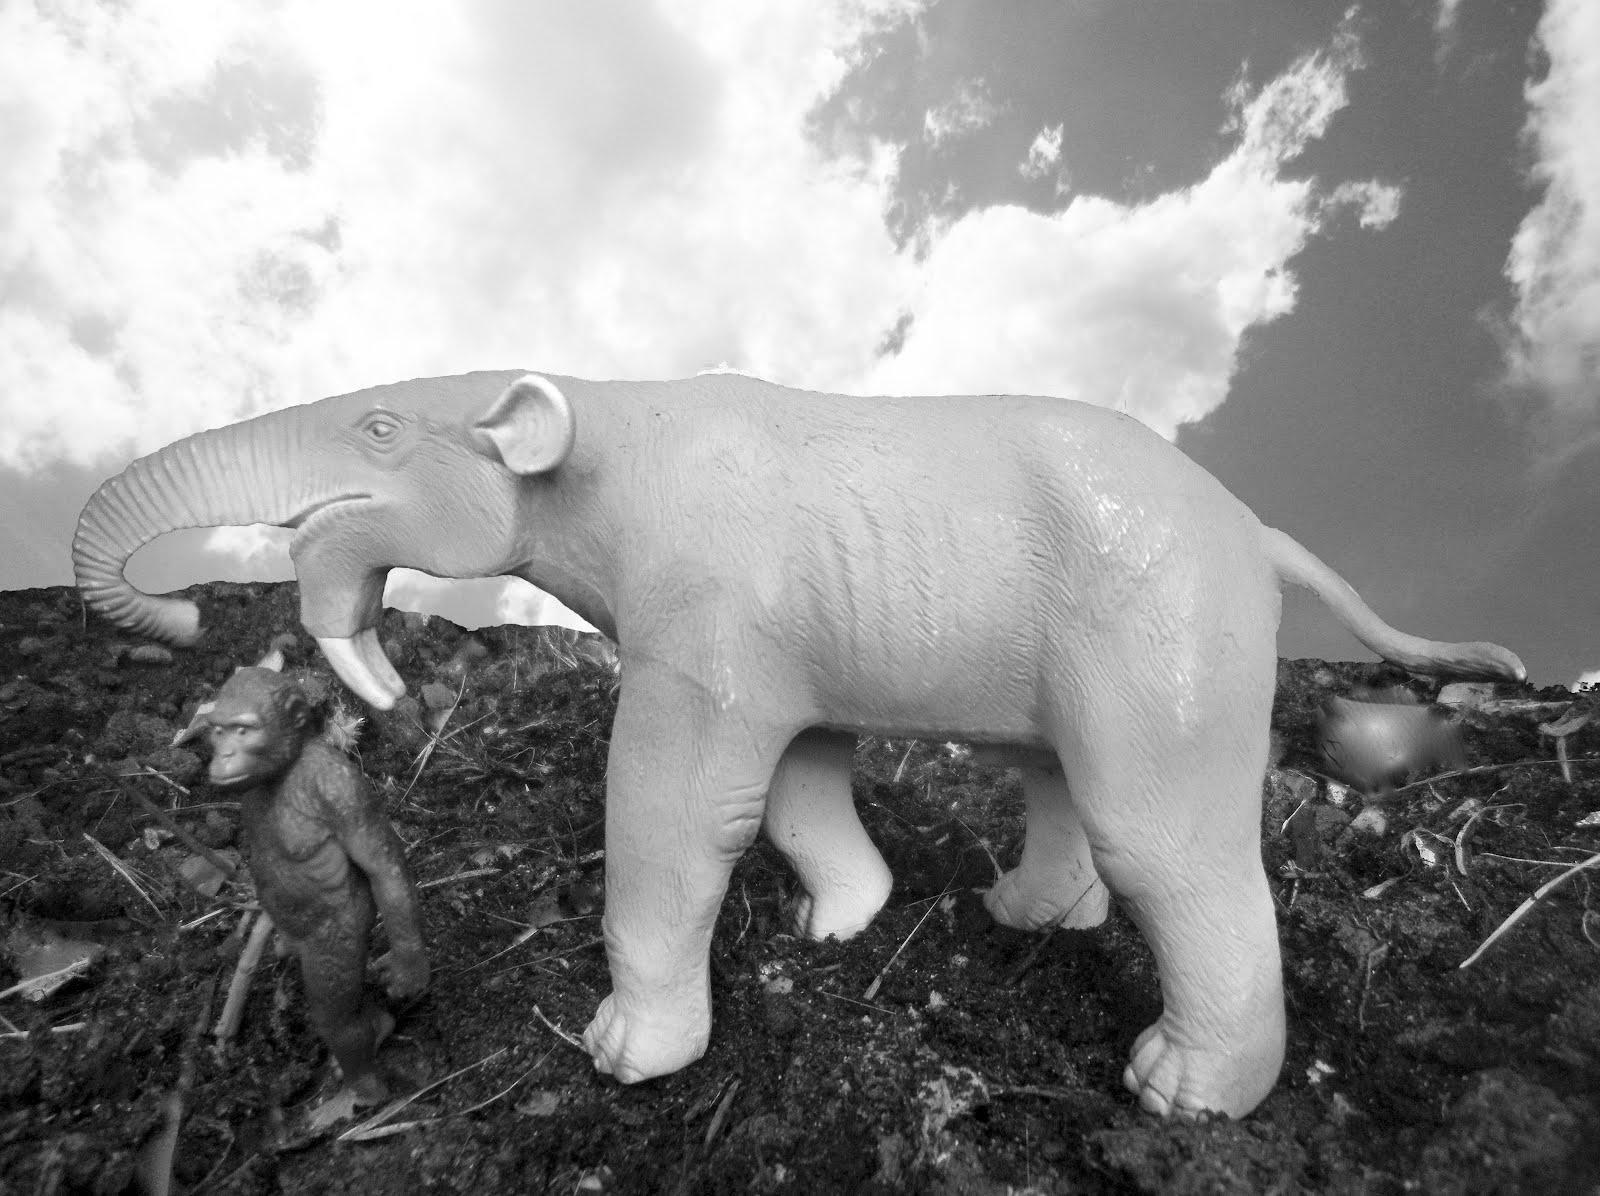 pygmy elephants the book july 2012